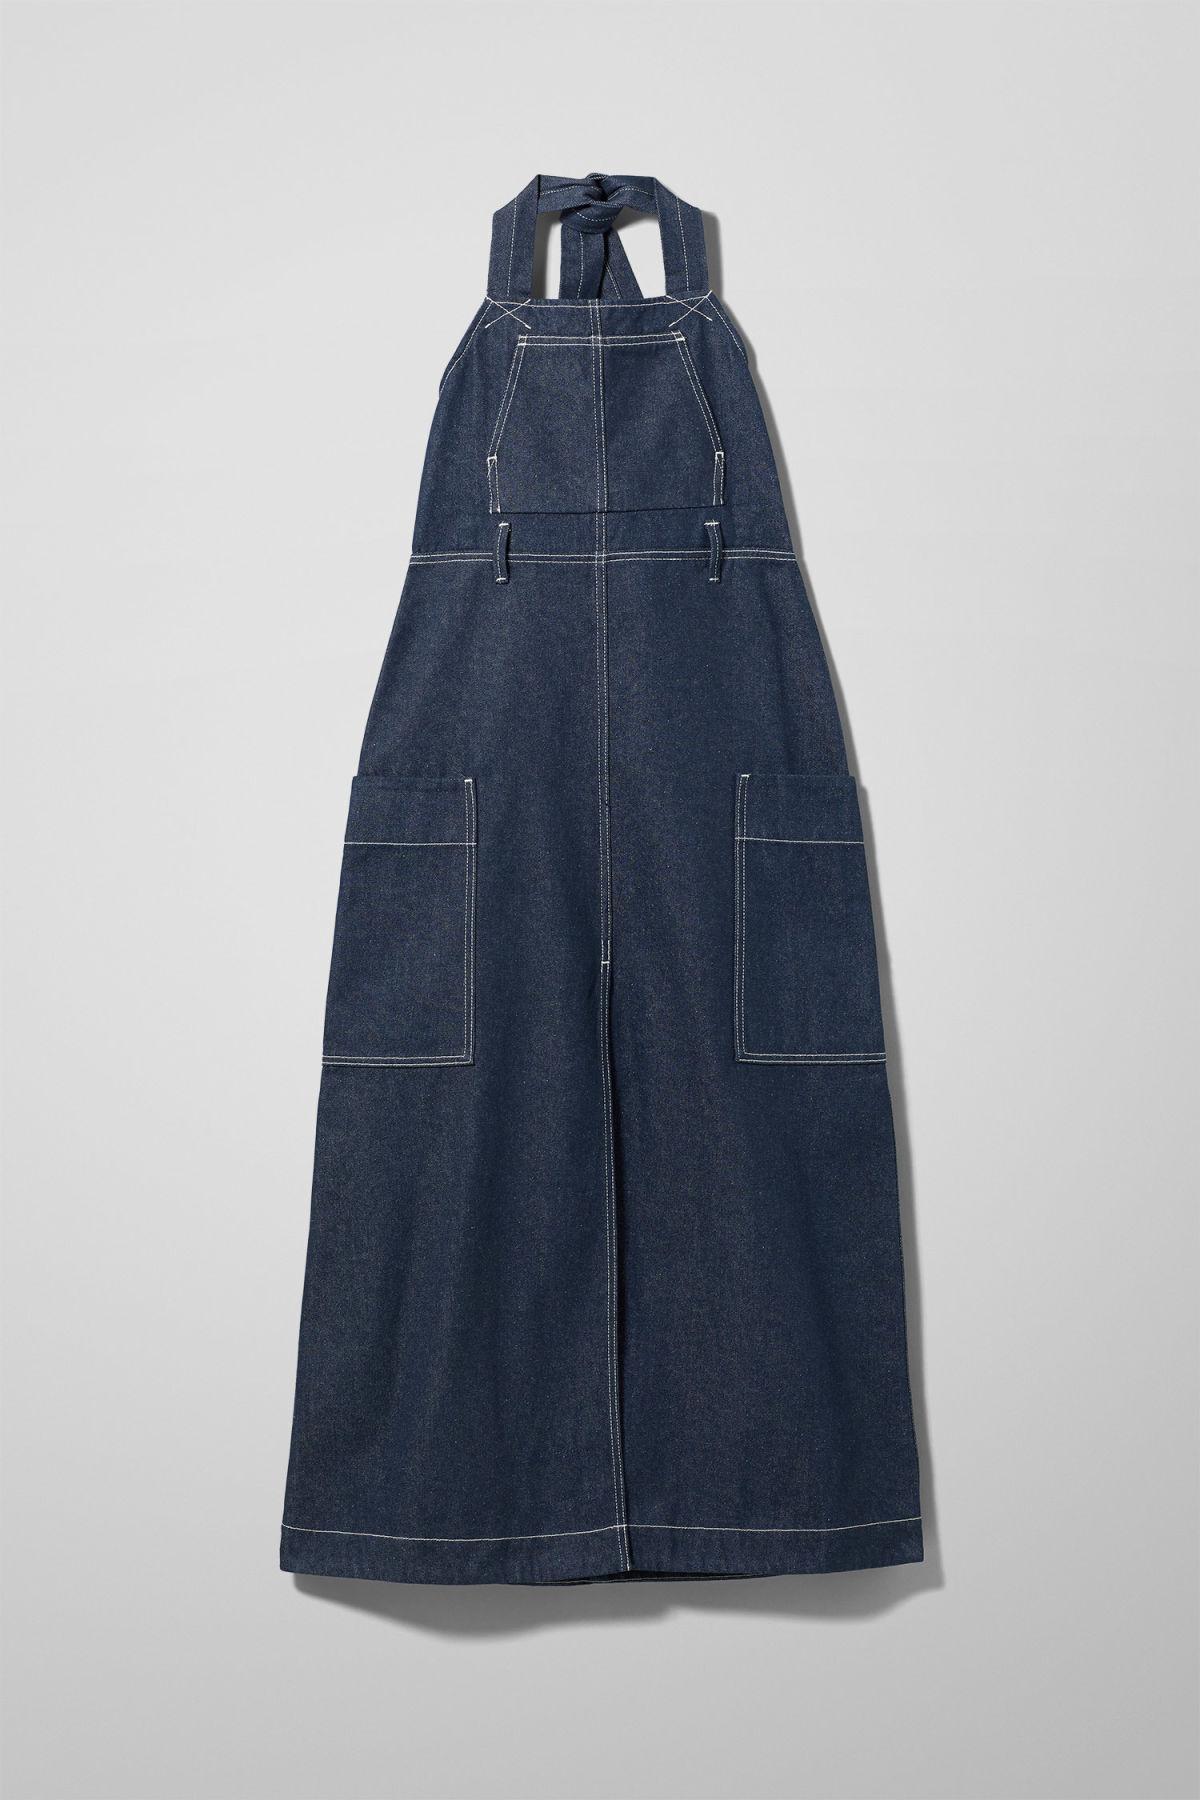 Image of Work Dress - Blue-XS